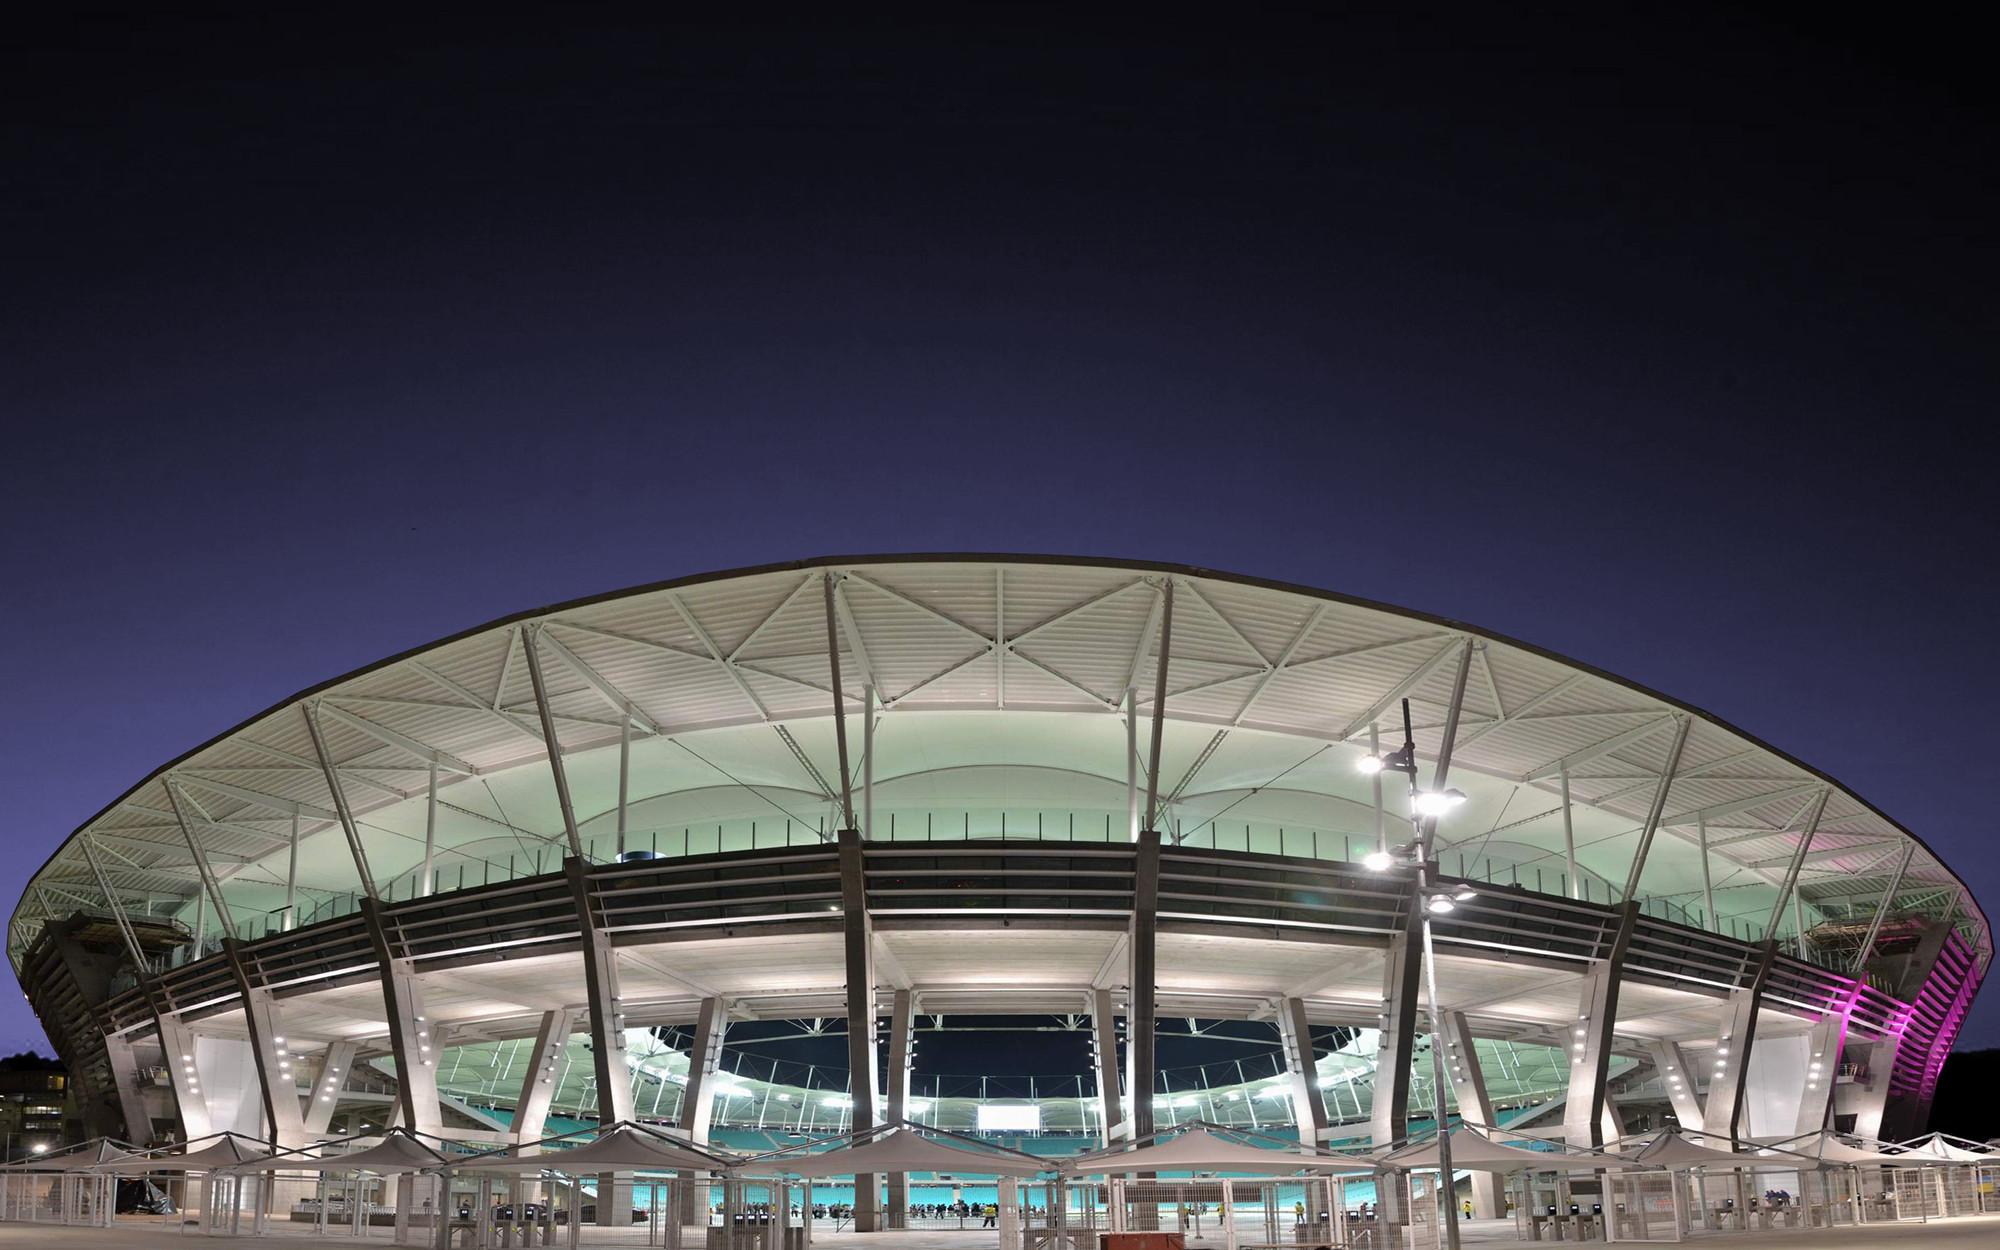 Estádios da Copa do Mundo no Brasil, Arena Fonte Nova, Salvador - BA. Image © © Erik Salles